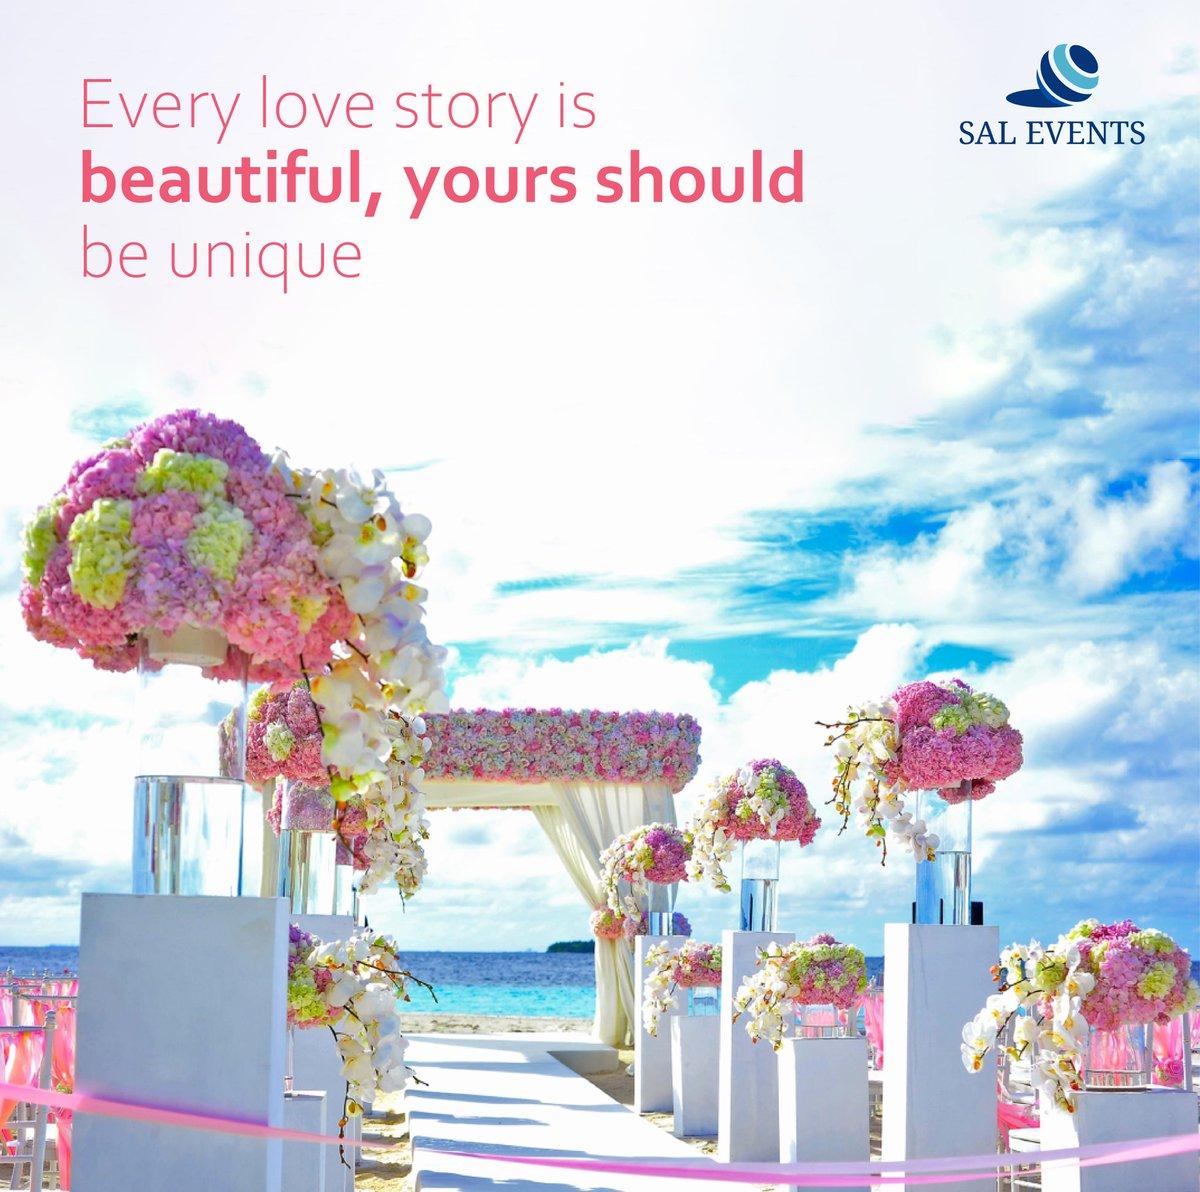 We make your wedding a fairy tale. Contact SAL Events on 506325045  #SALEvents #Wedding #Weddings #WeddingsInUAE #WeddingPlannersInUAE #ArabicWedding #ChristianWedding #IndianWedding #PakistaniWedding #Nikah #BestWeddingPlannerInDubai #BudgetWeddingPlannerInDubaipic.twitter.com/kG1fdaKFOY